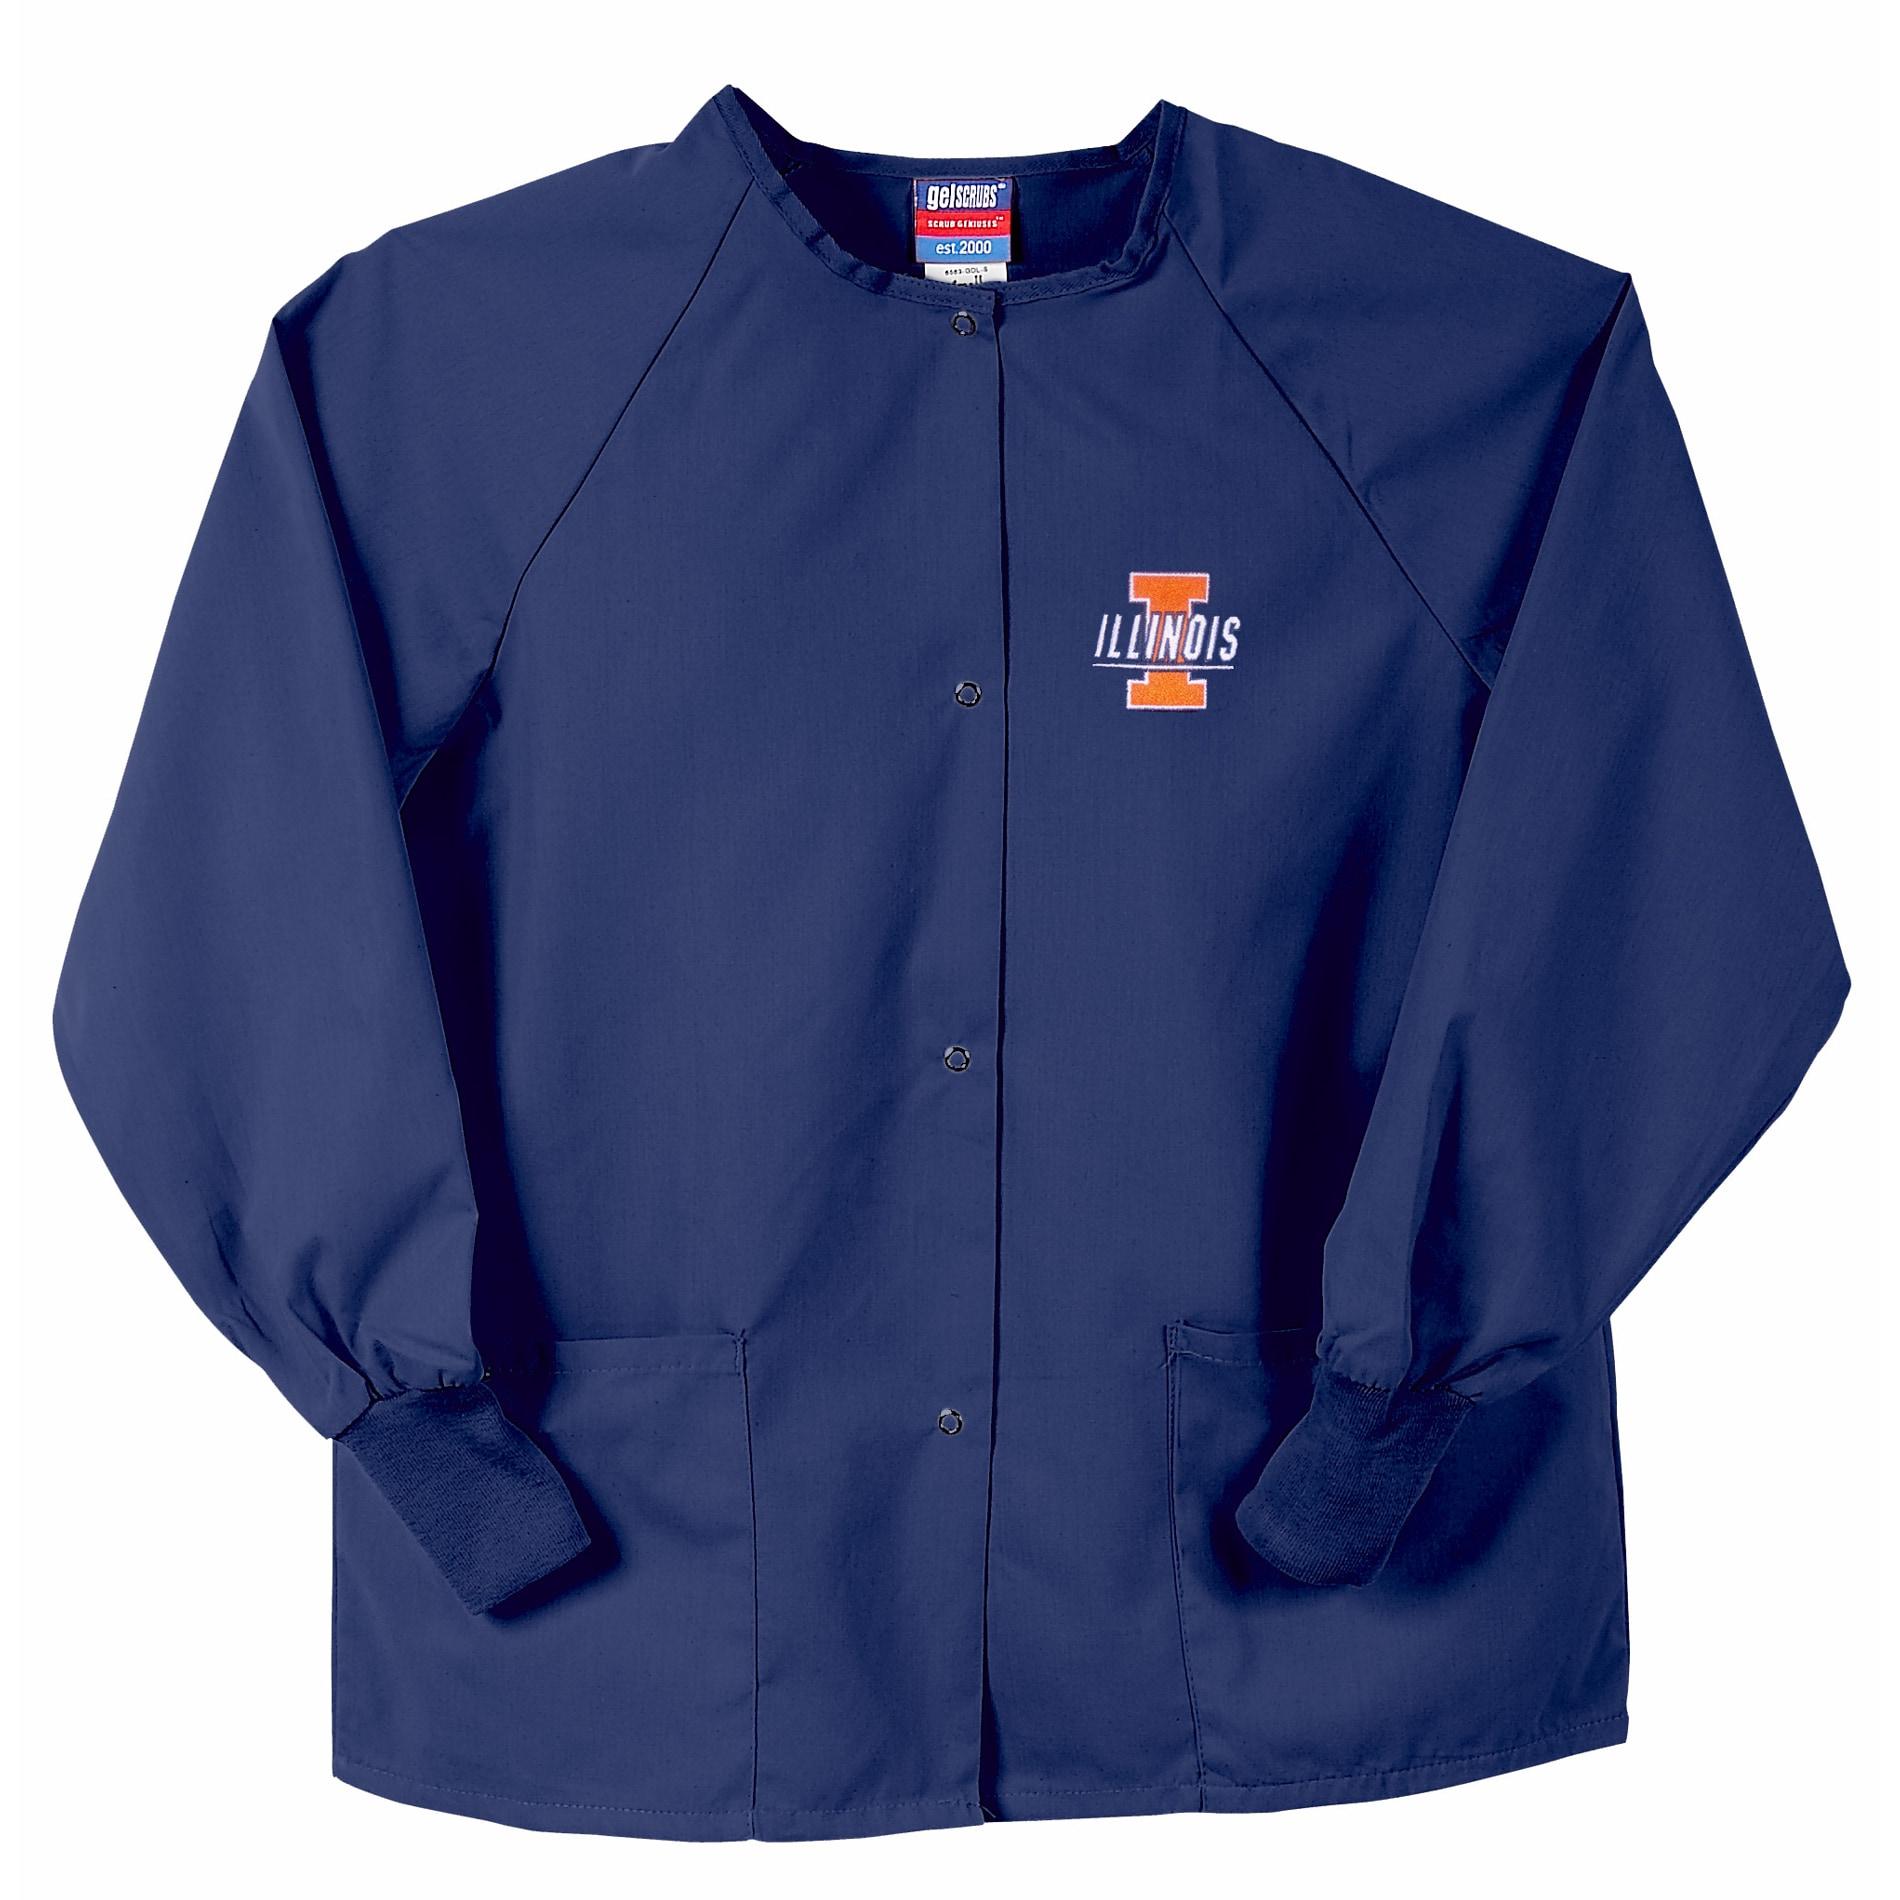 Gelscrubs Unisex NCAA Navy Illinois Illini Nurse Jacket  : Gelscrubs Unisex NCAA Navy Illinois Illini Nurse Jacket L13996407 from www.overstock.com size 1900 x 1900 jpeg 337kB